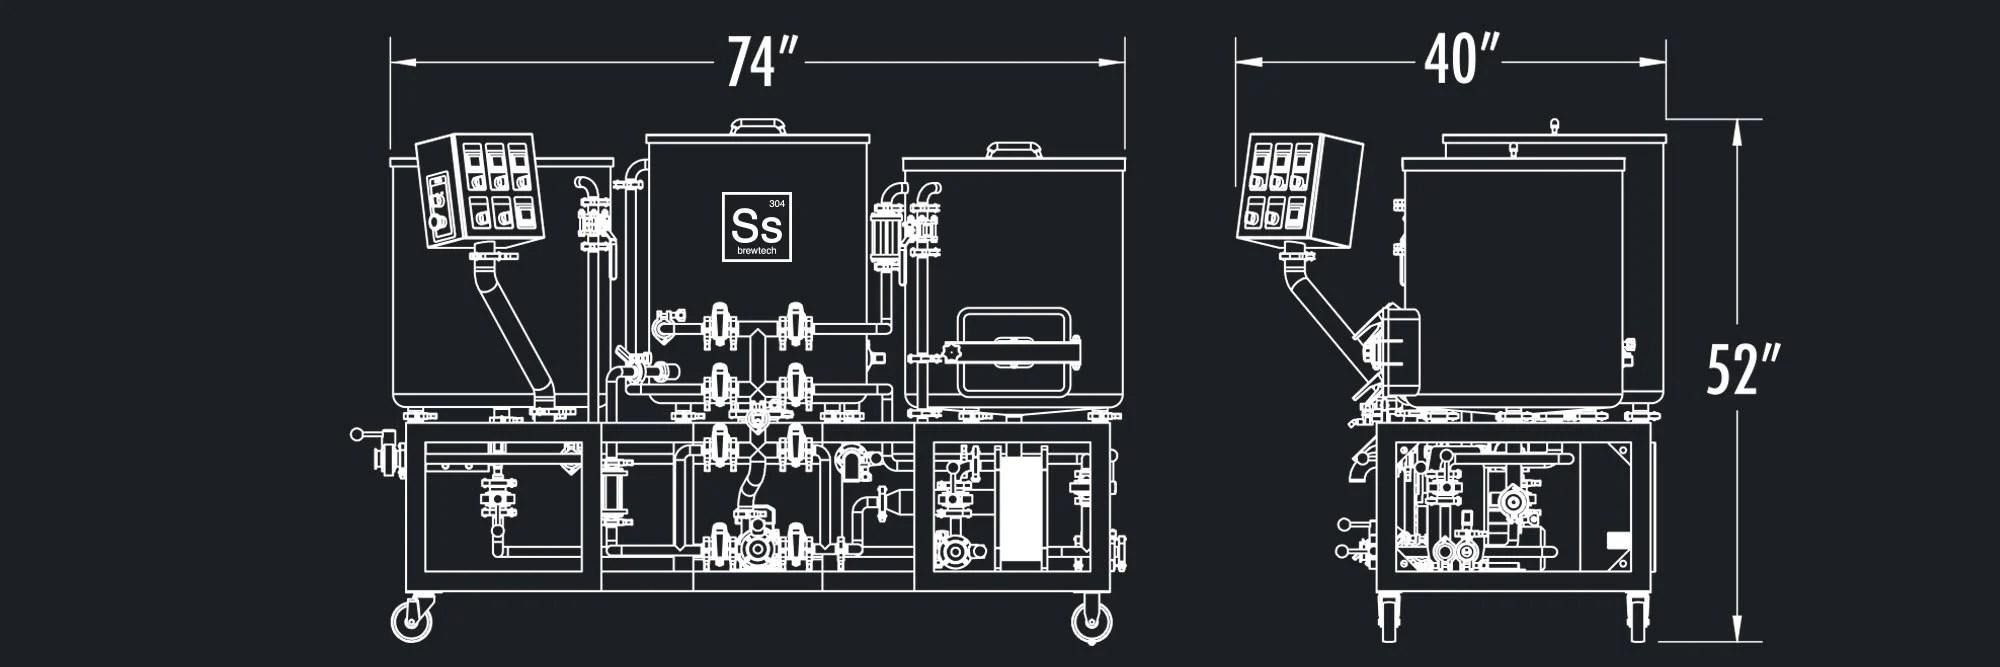 nano breweries using ss gear [ 2000 x 667 Pixel ]